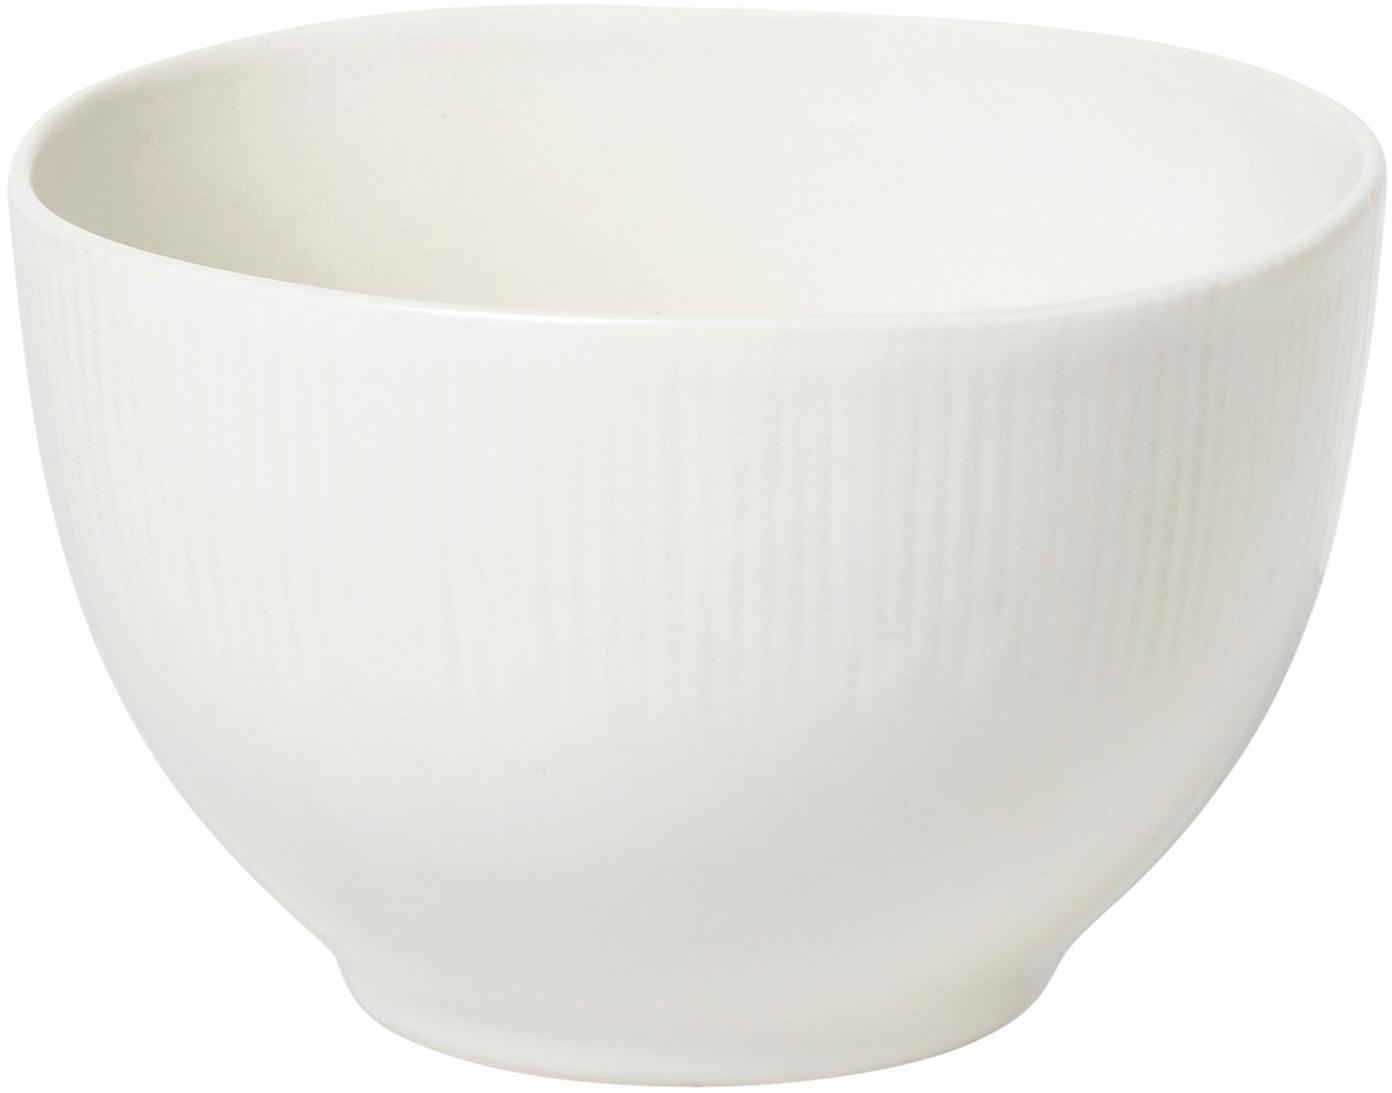 Handgemaakte schalen Sandvig, 4 stuks, Gekleurde porselein, Gebroken wit, Ø 14 x H 8 cm